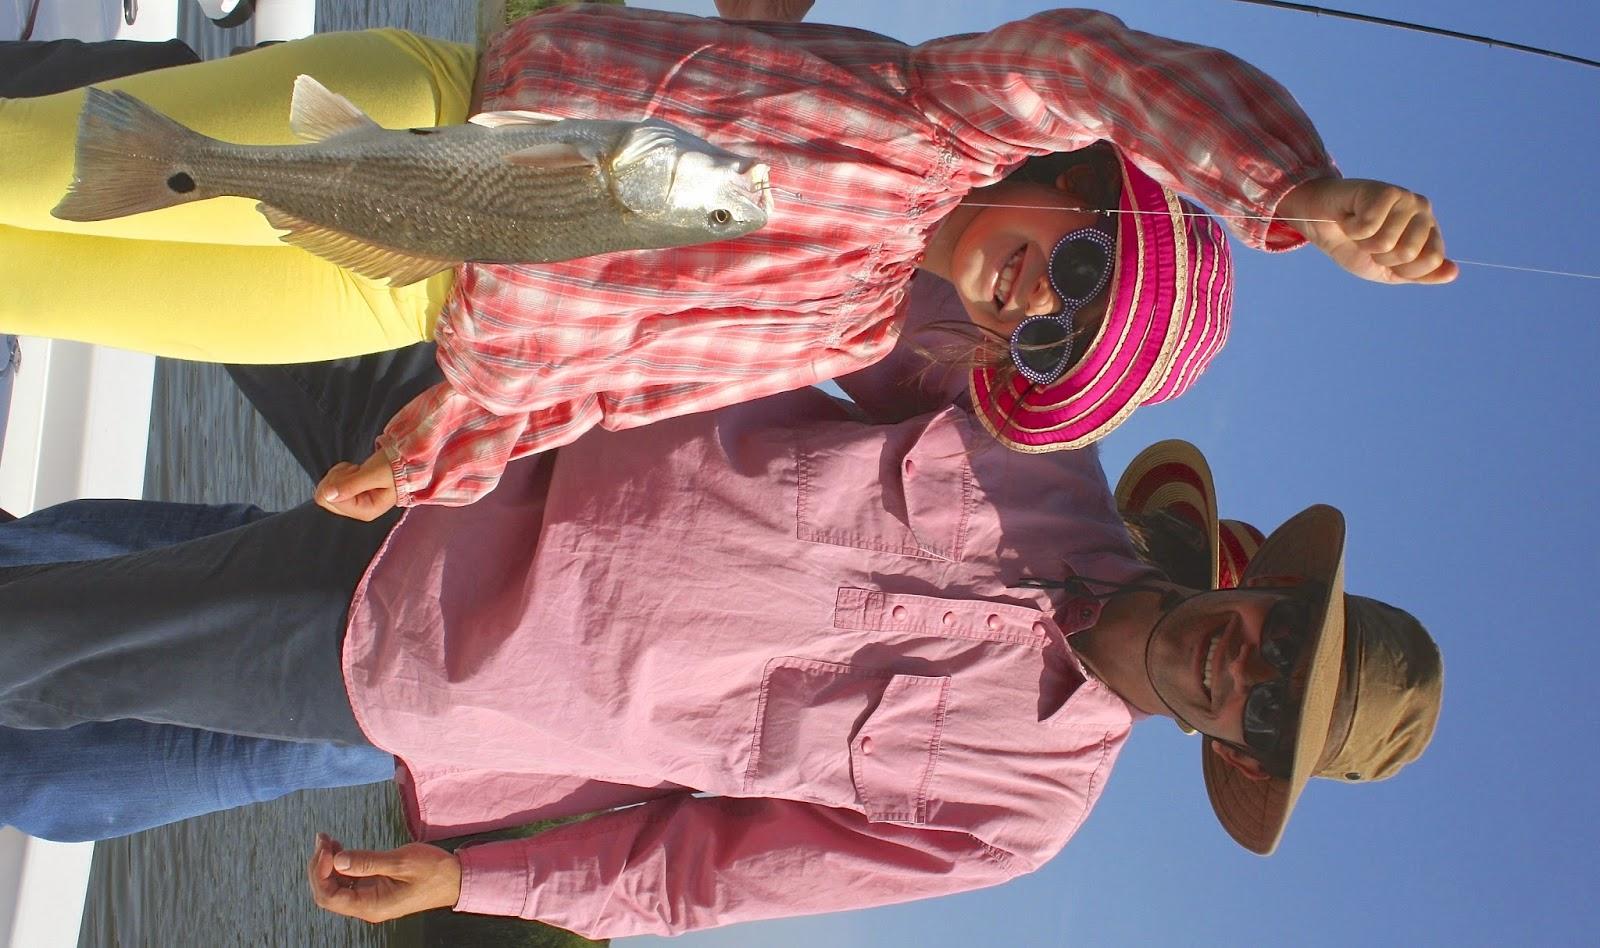 Affinity charters kiawah inshore and shark fishing charter for Kiawah island fishing